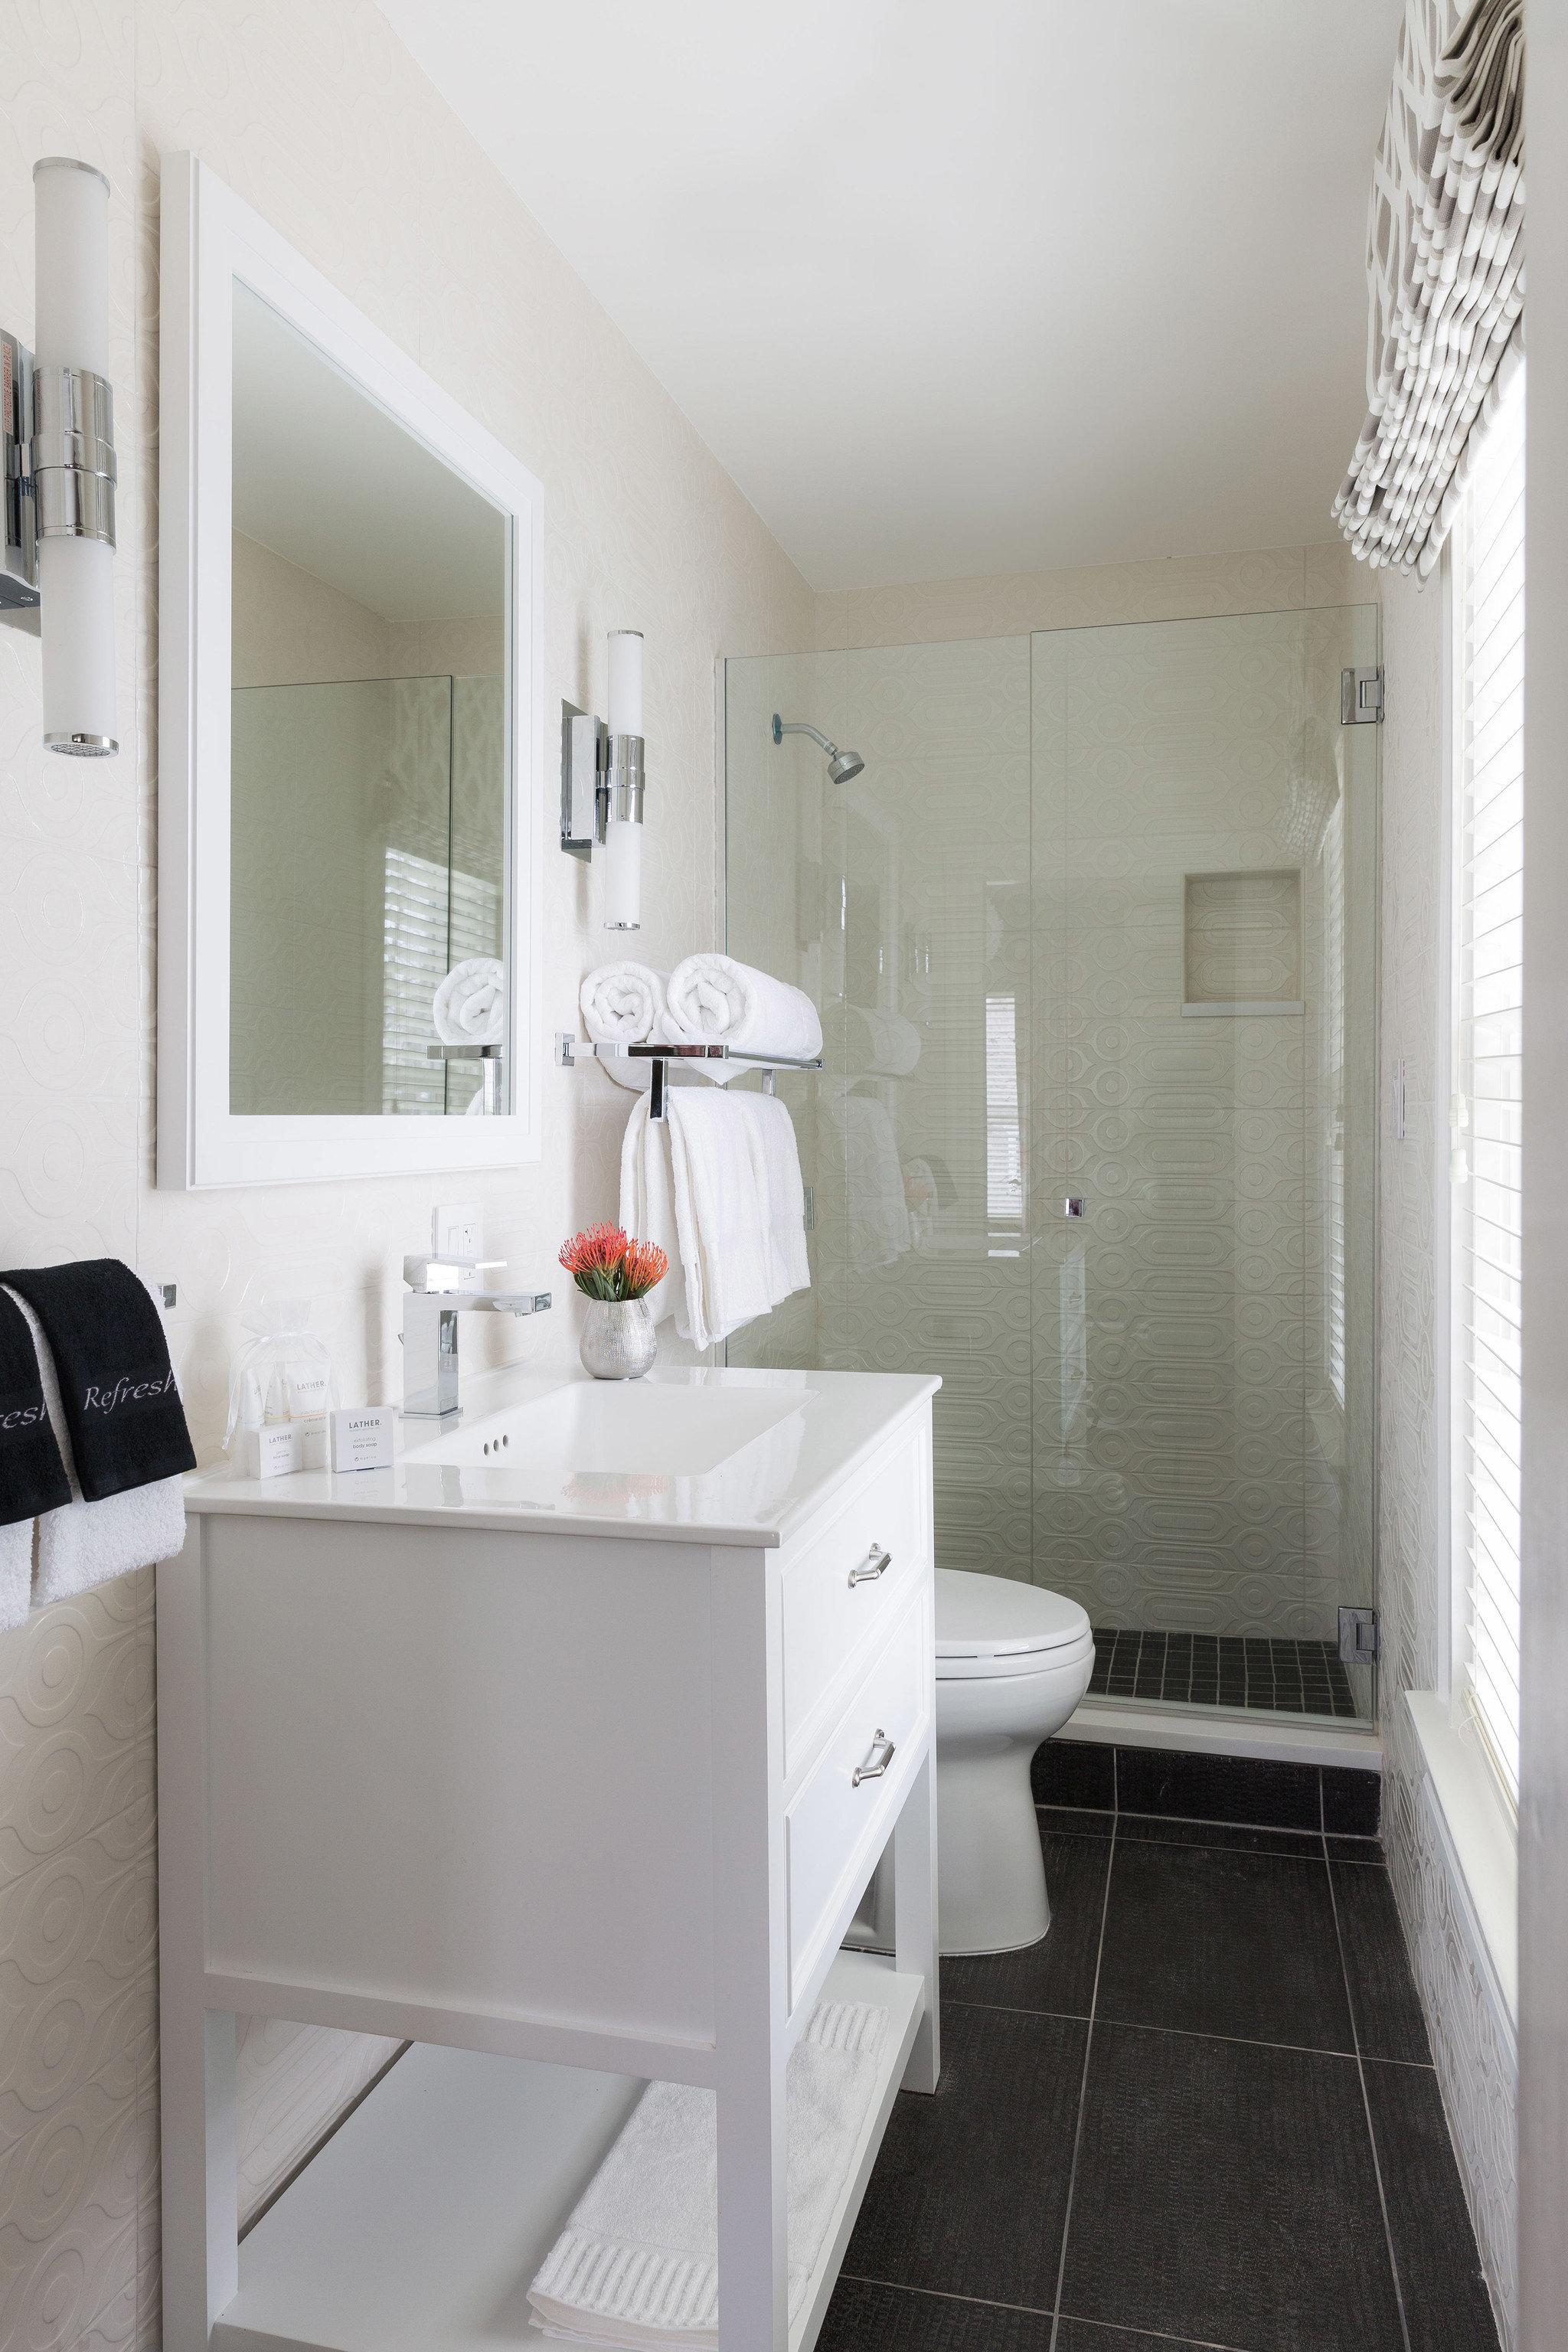 bathroom white property toilet home plumbing fixture bidet flooring sink bathroom cabinet cottage tiled tile Bath